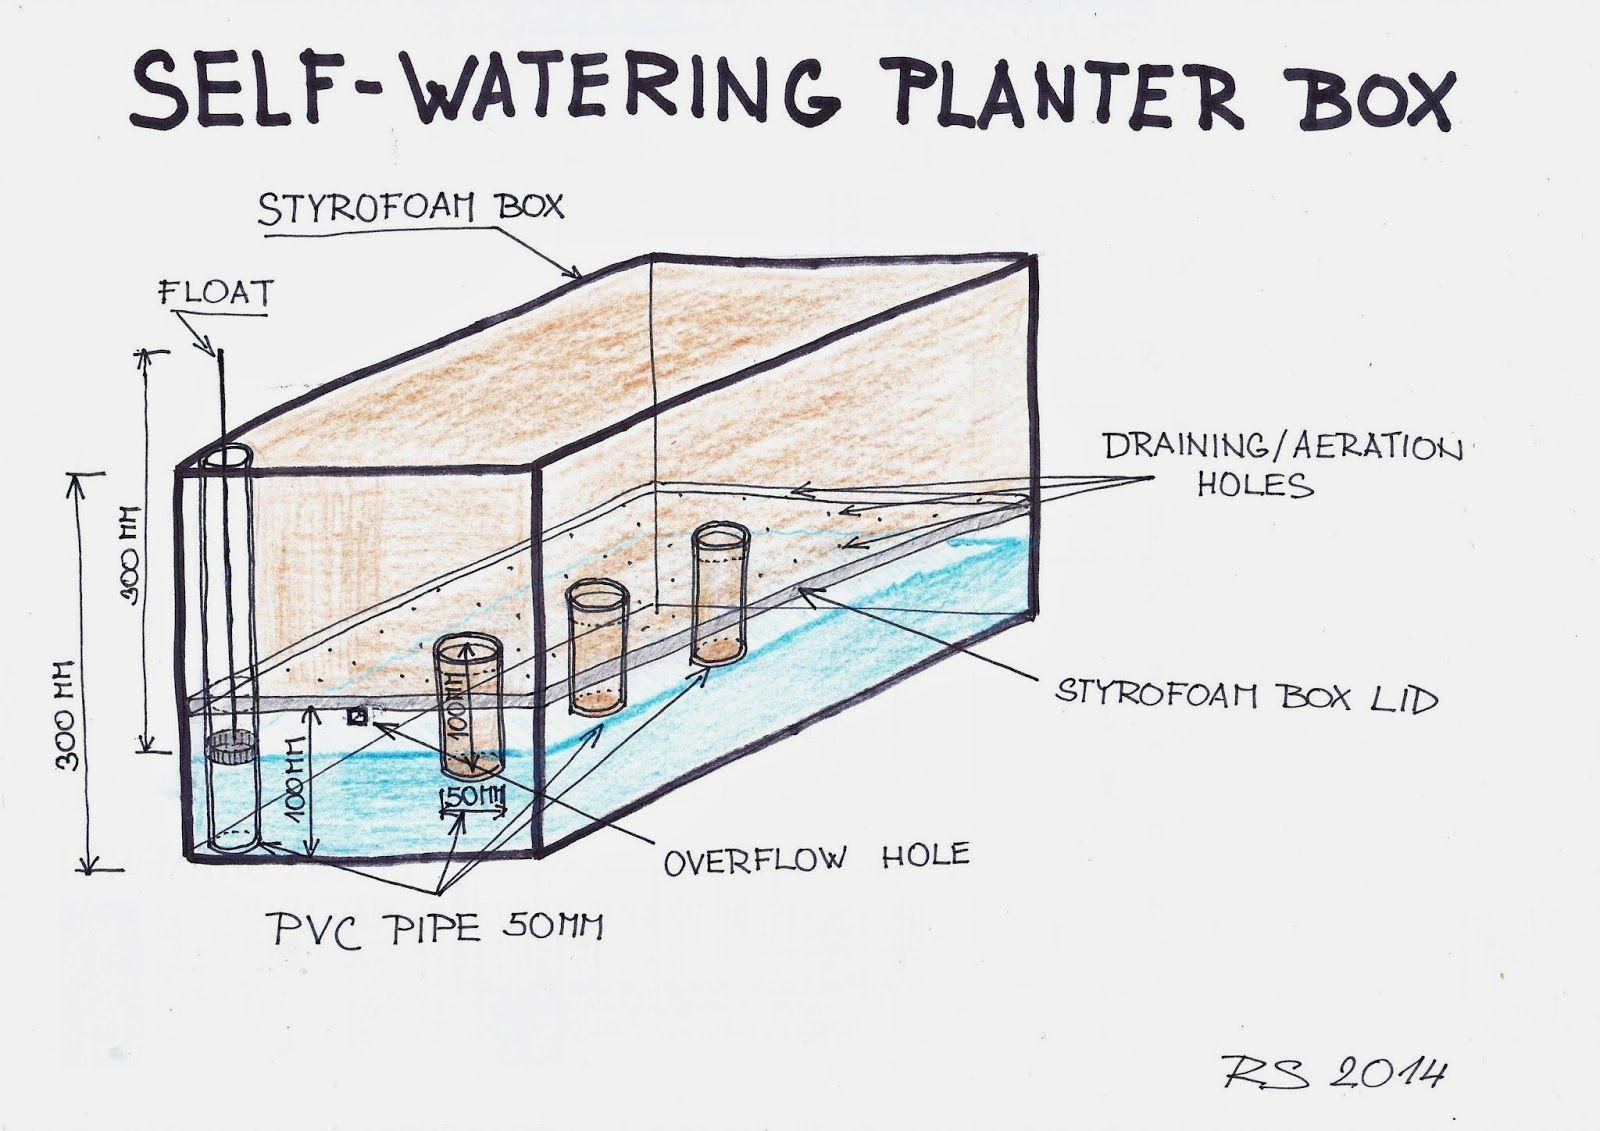 medium resolution of self watering planter box schematic diagram self watering planters